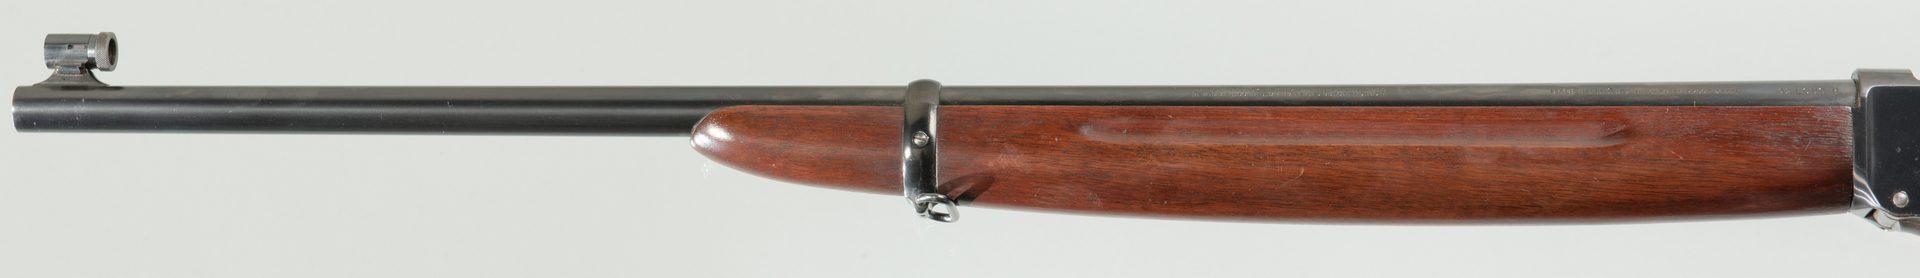 Lot 794: Winchester 1885 Single Shot, Falling Block Hi-Wall